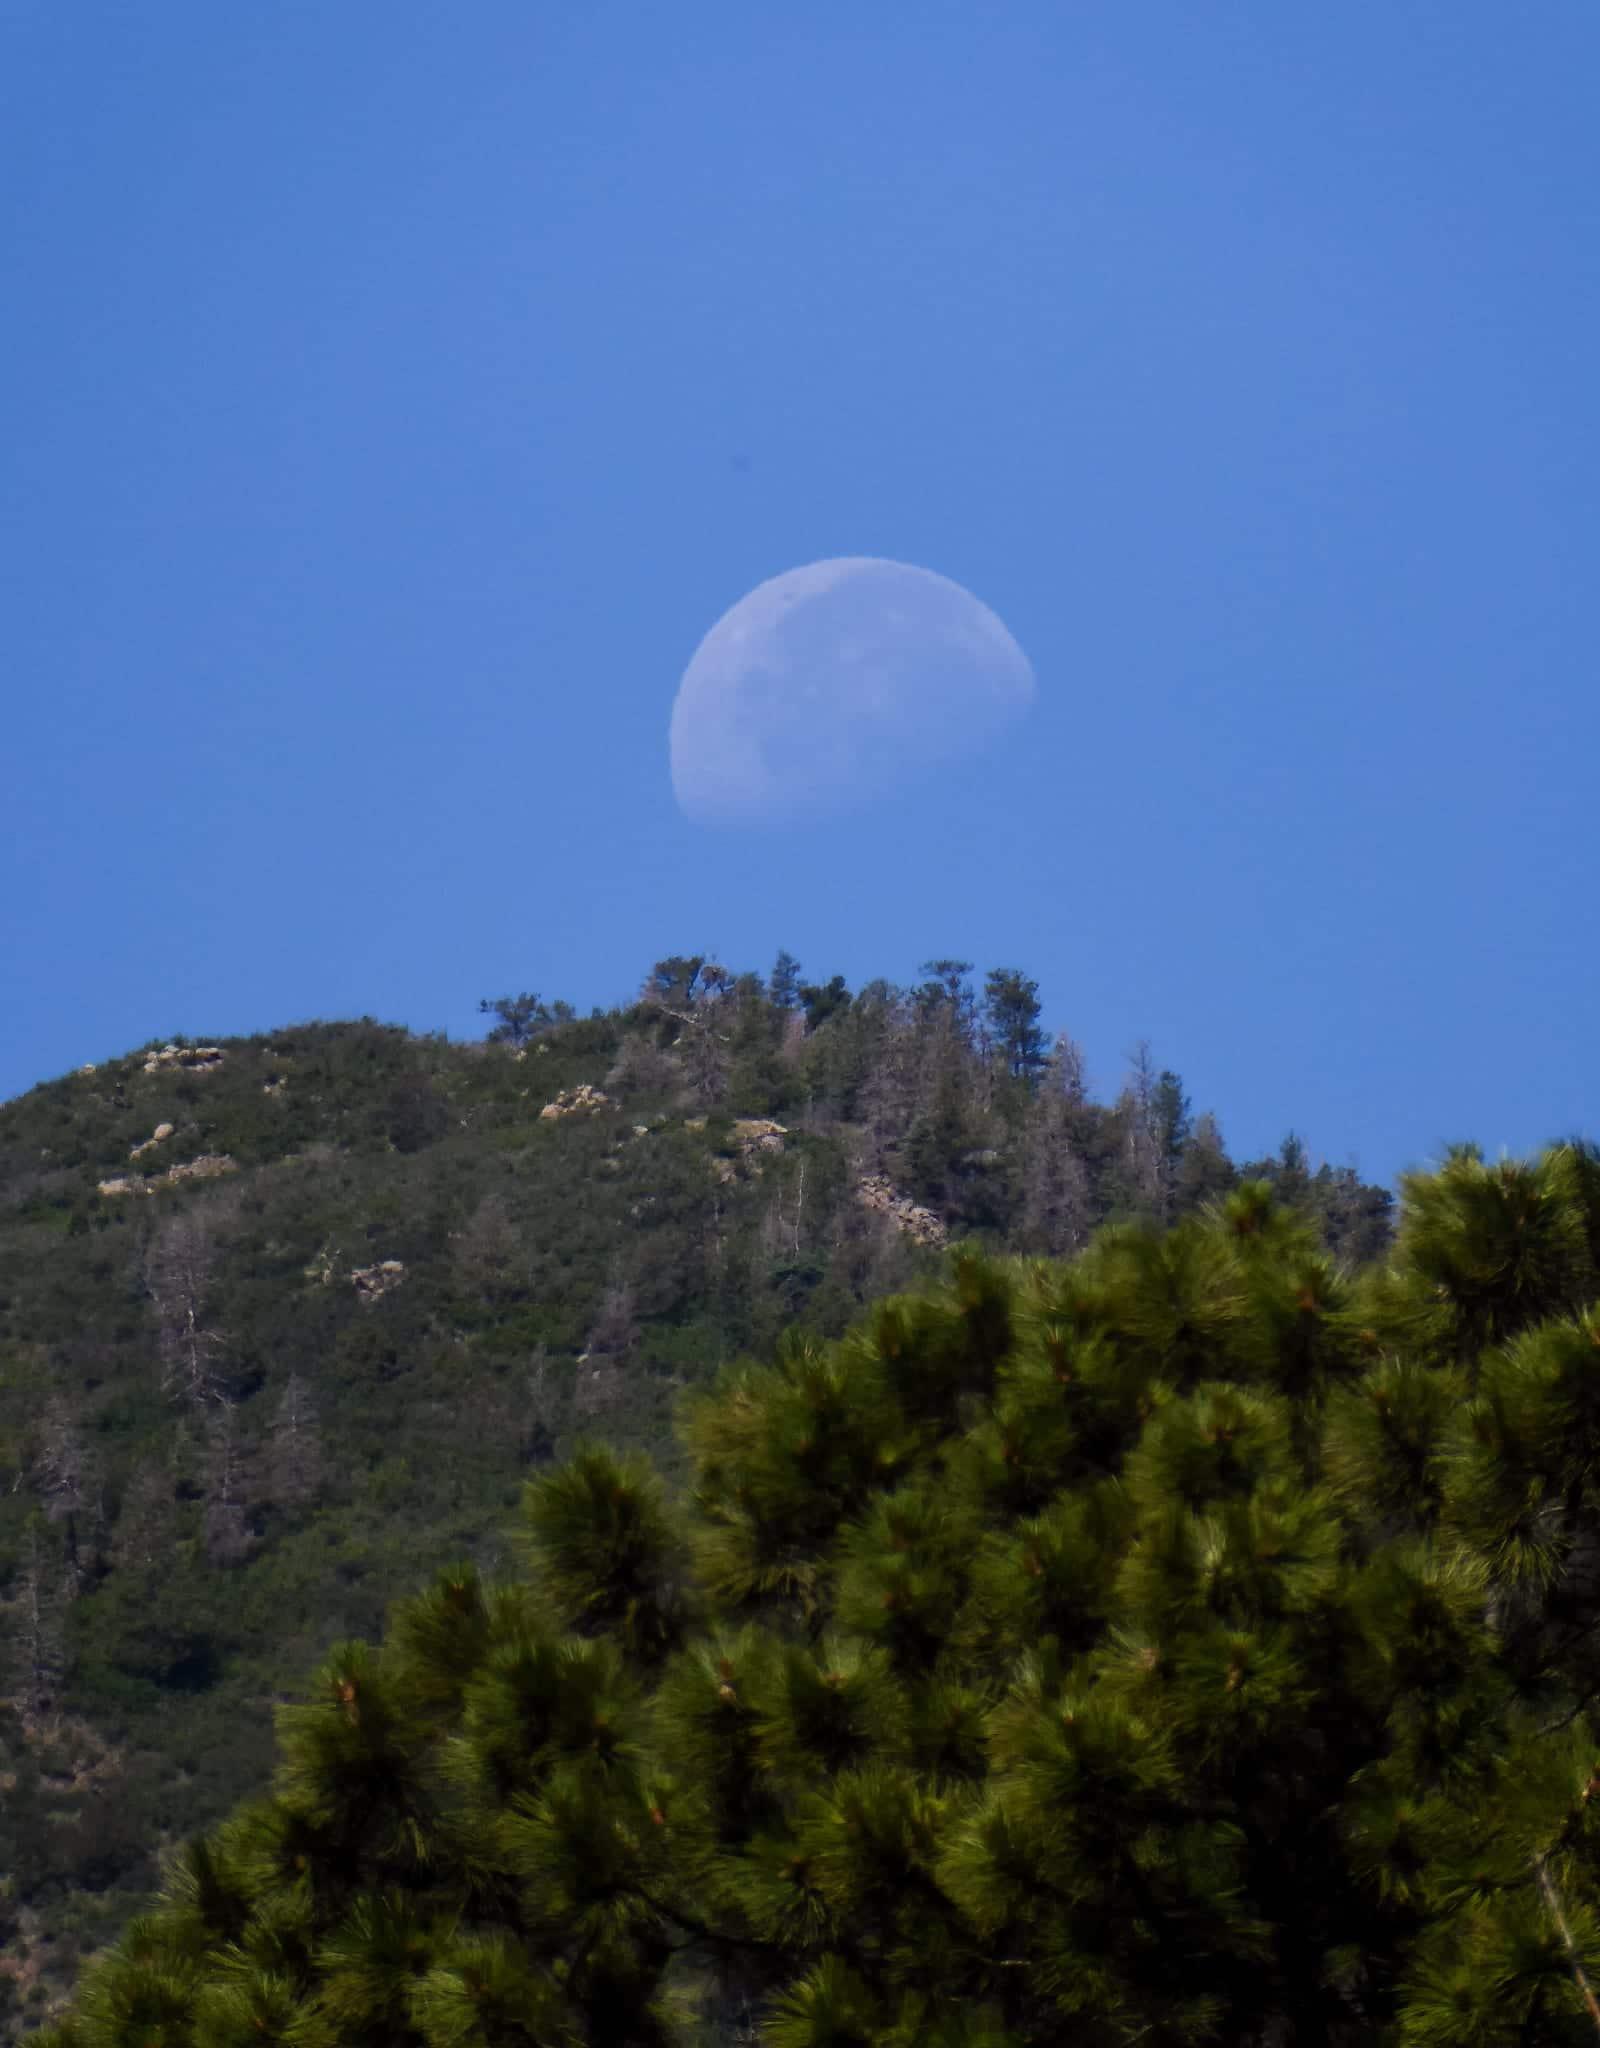 Cheyenne Mountain State Park Summit Moon Colorado Springs